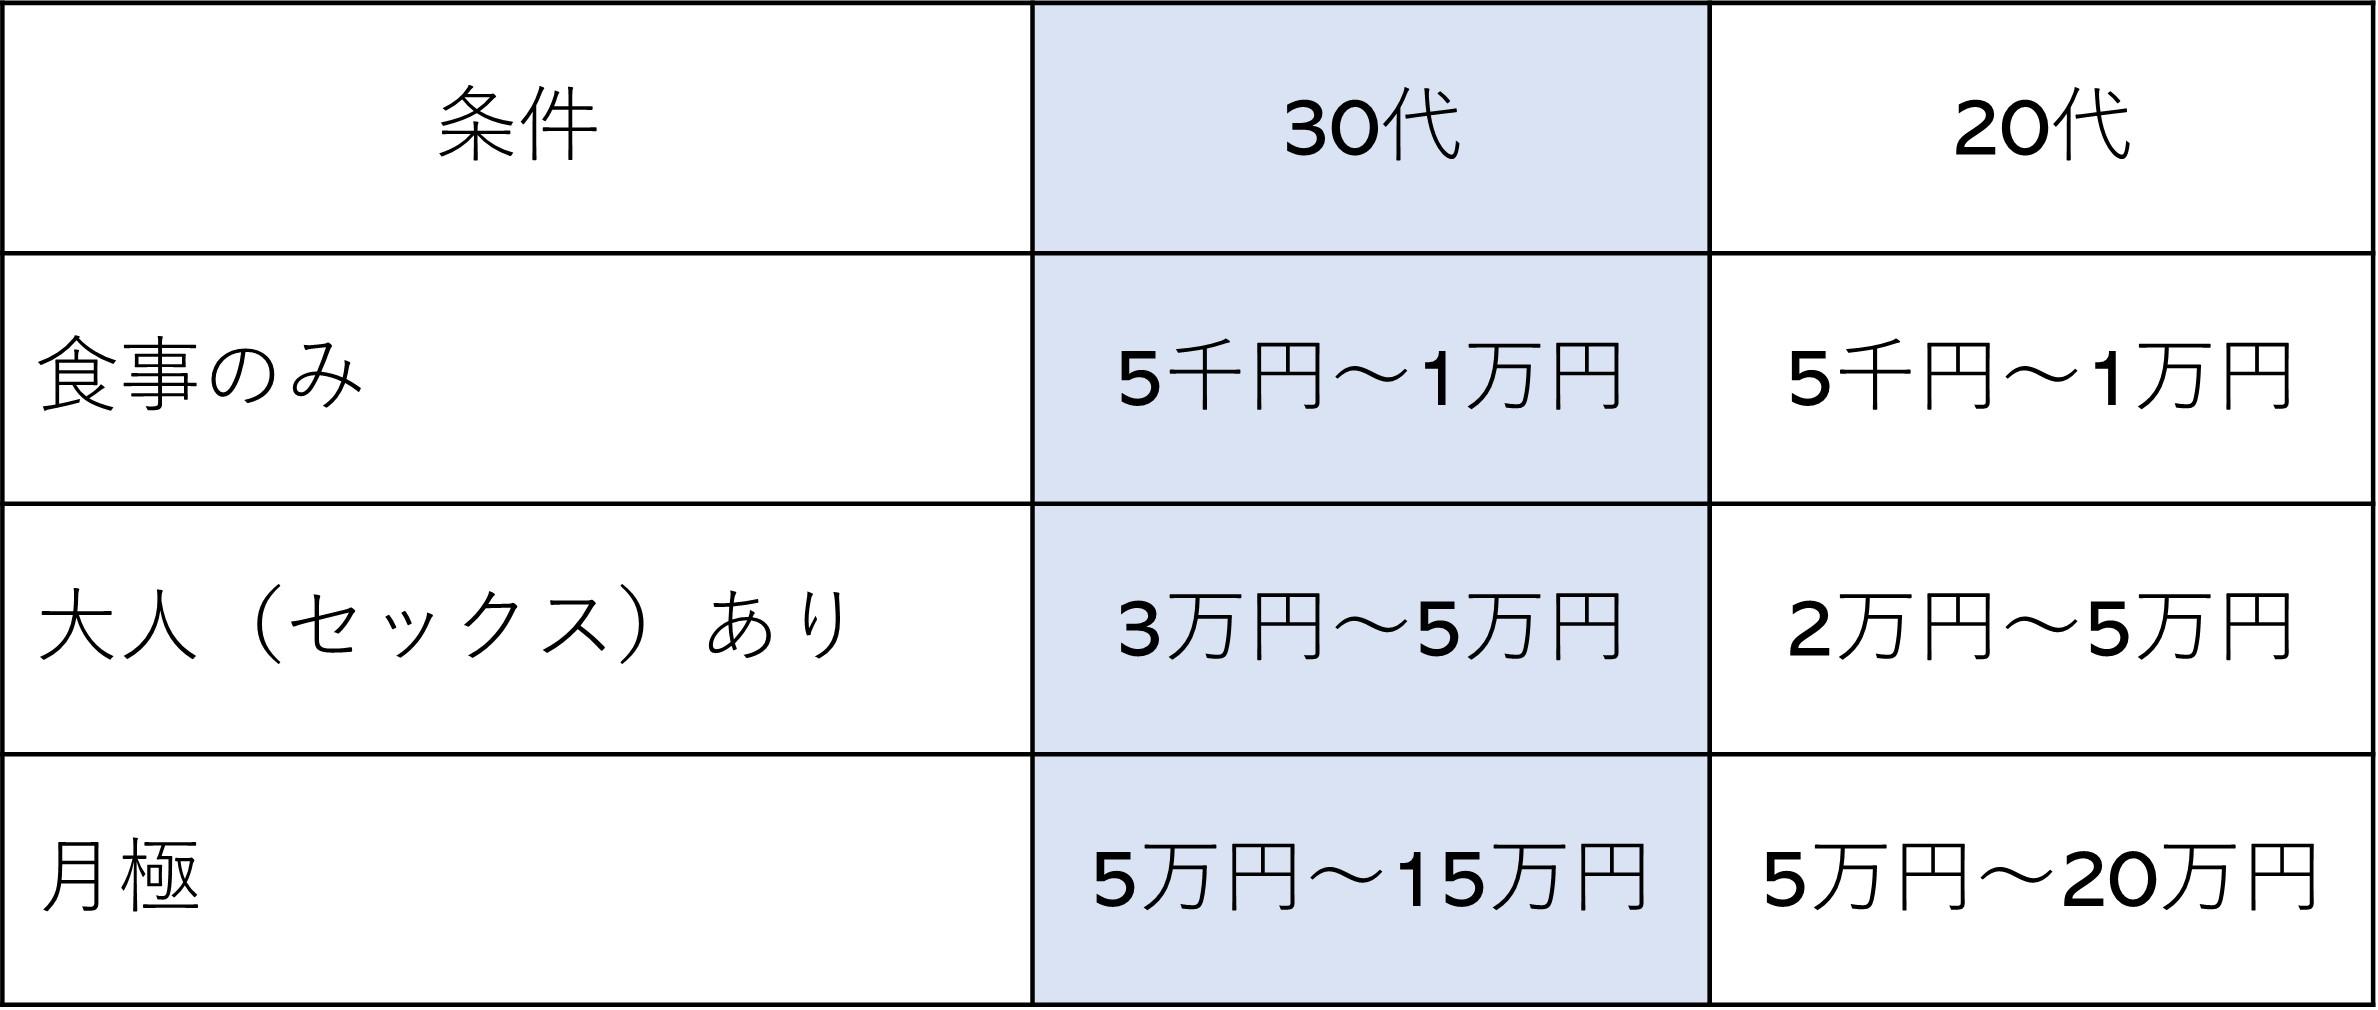 P活 30代 2